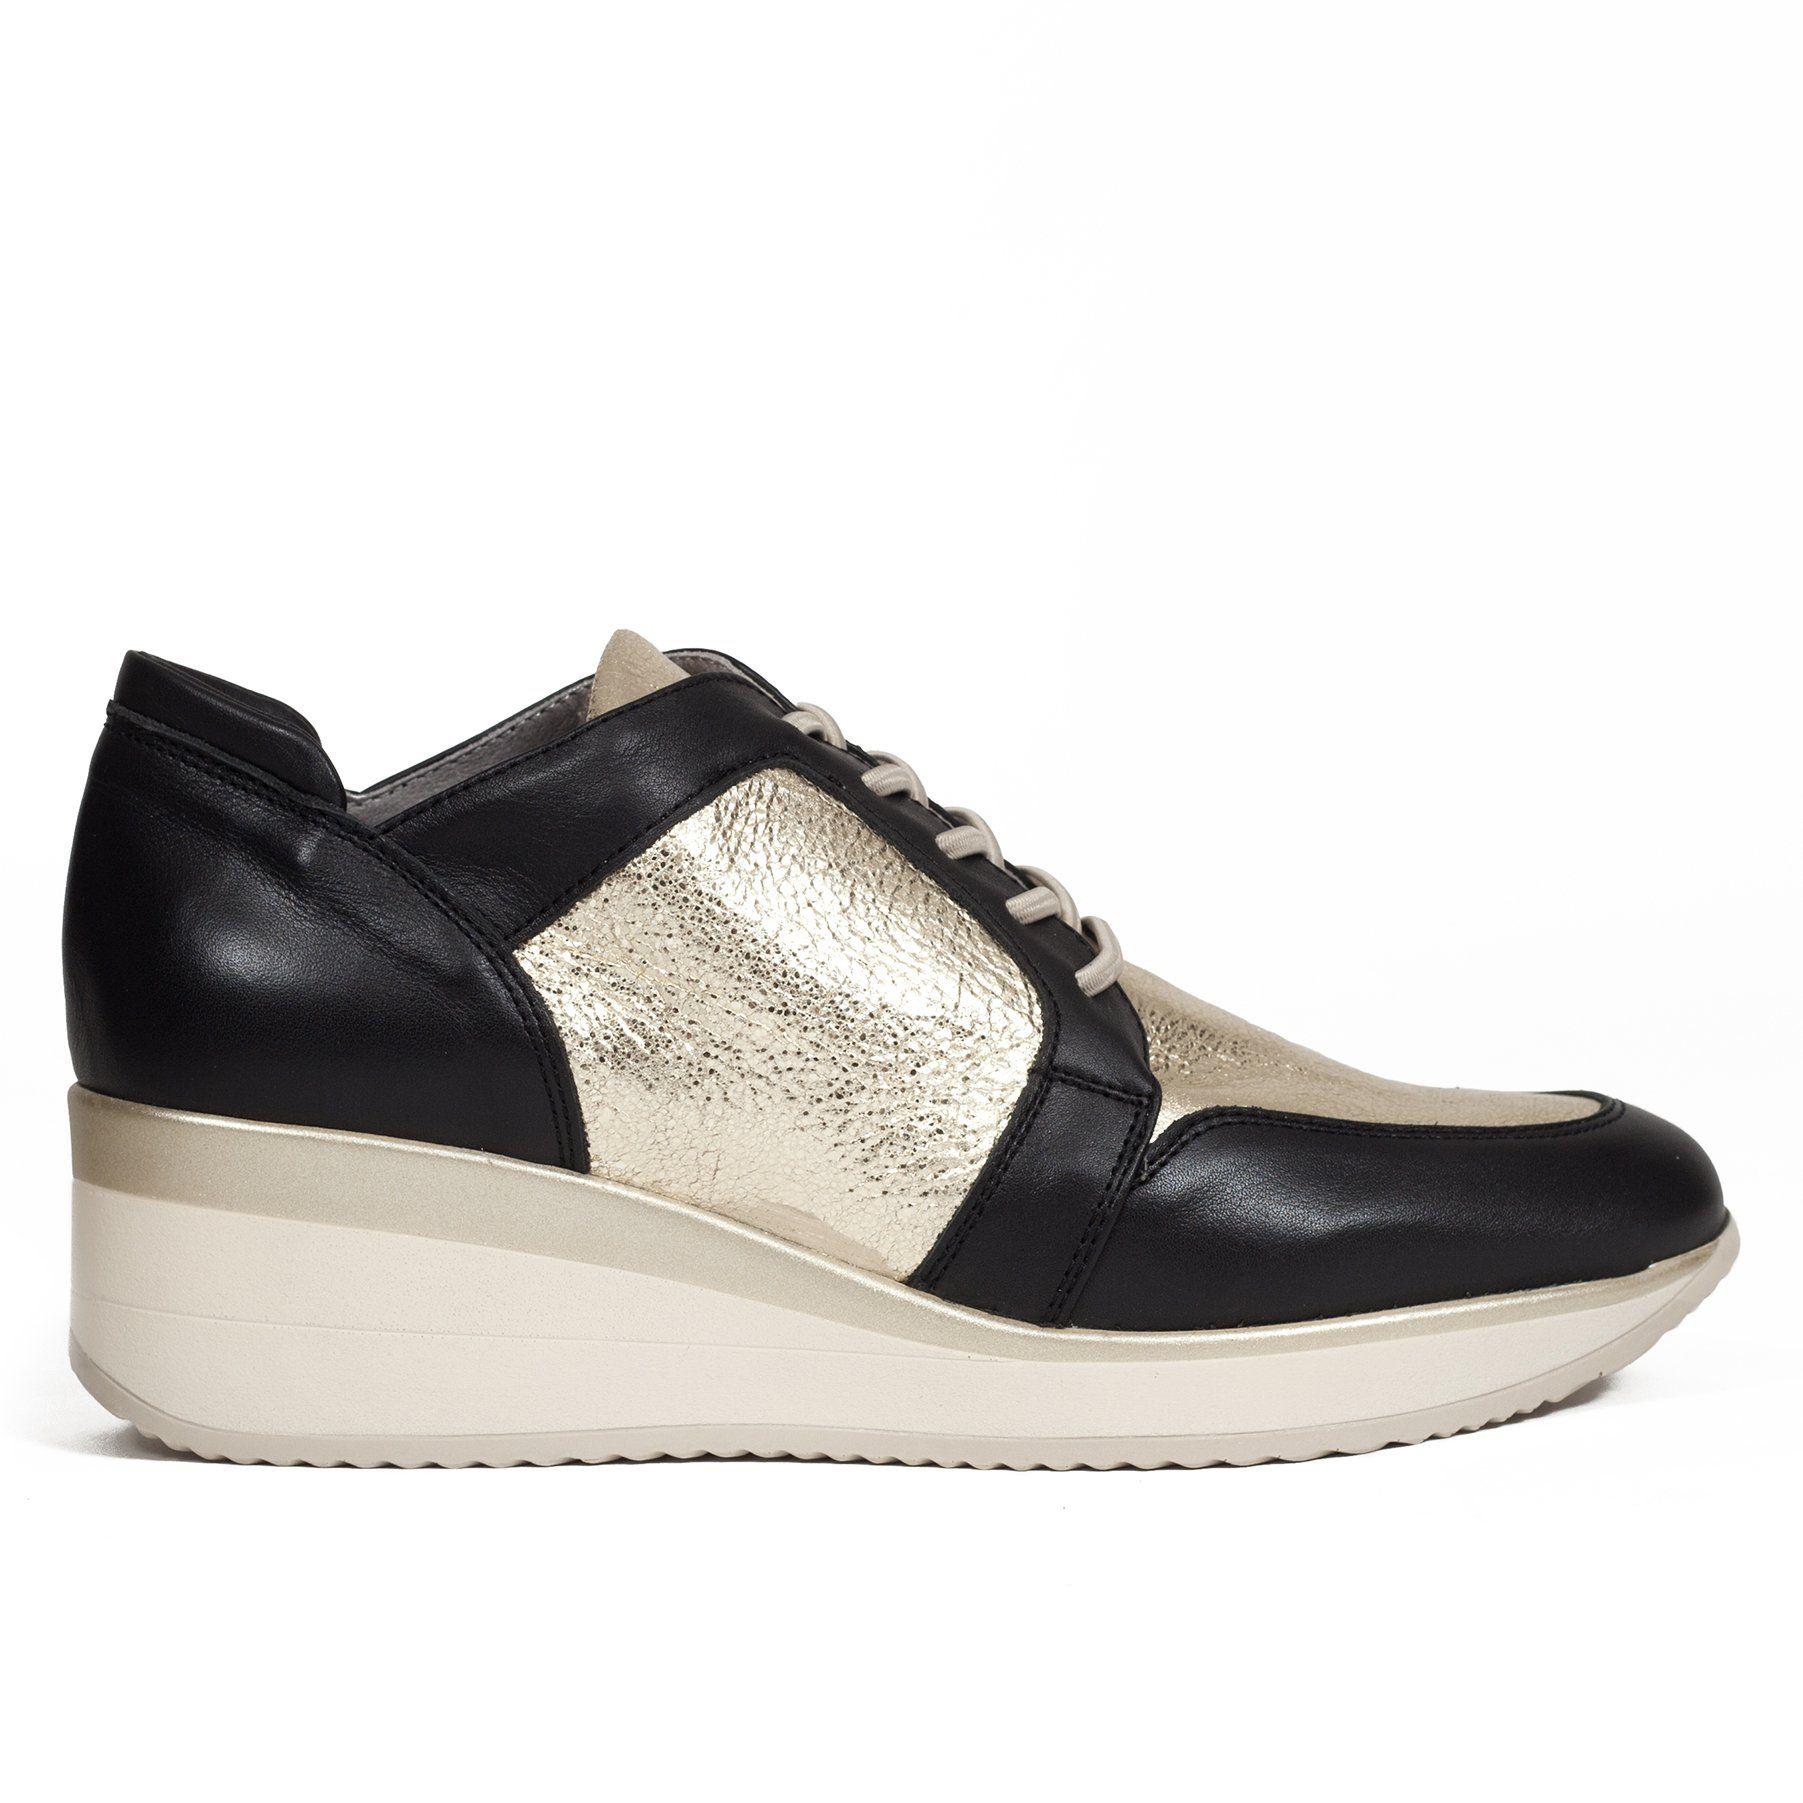 hot sale online c21d6 8ff9c Zapato Deportivo cuña mujer Oro MEMORY FOAM - miMaO Zapatos – miMaO  ShopOnline